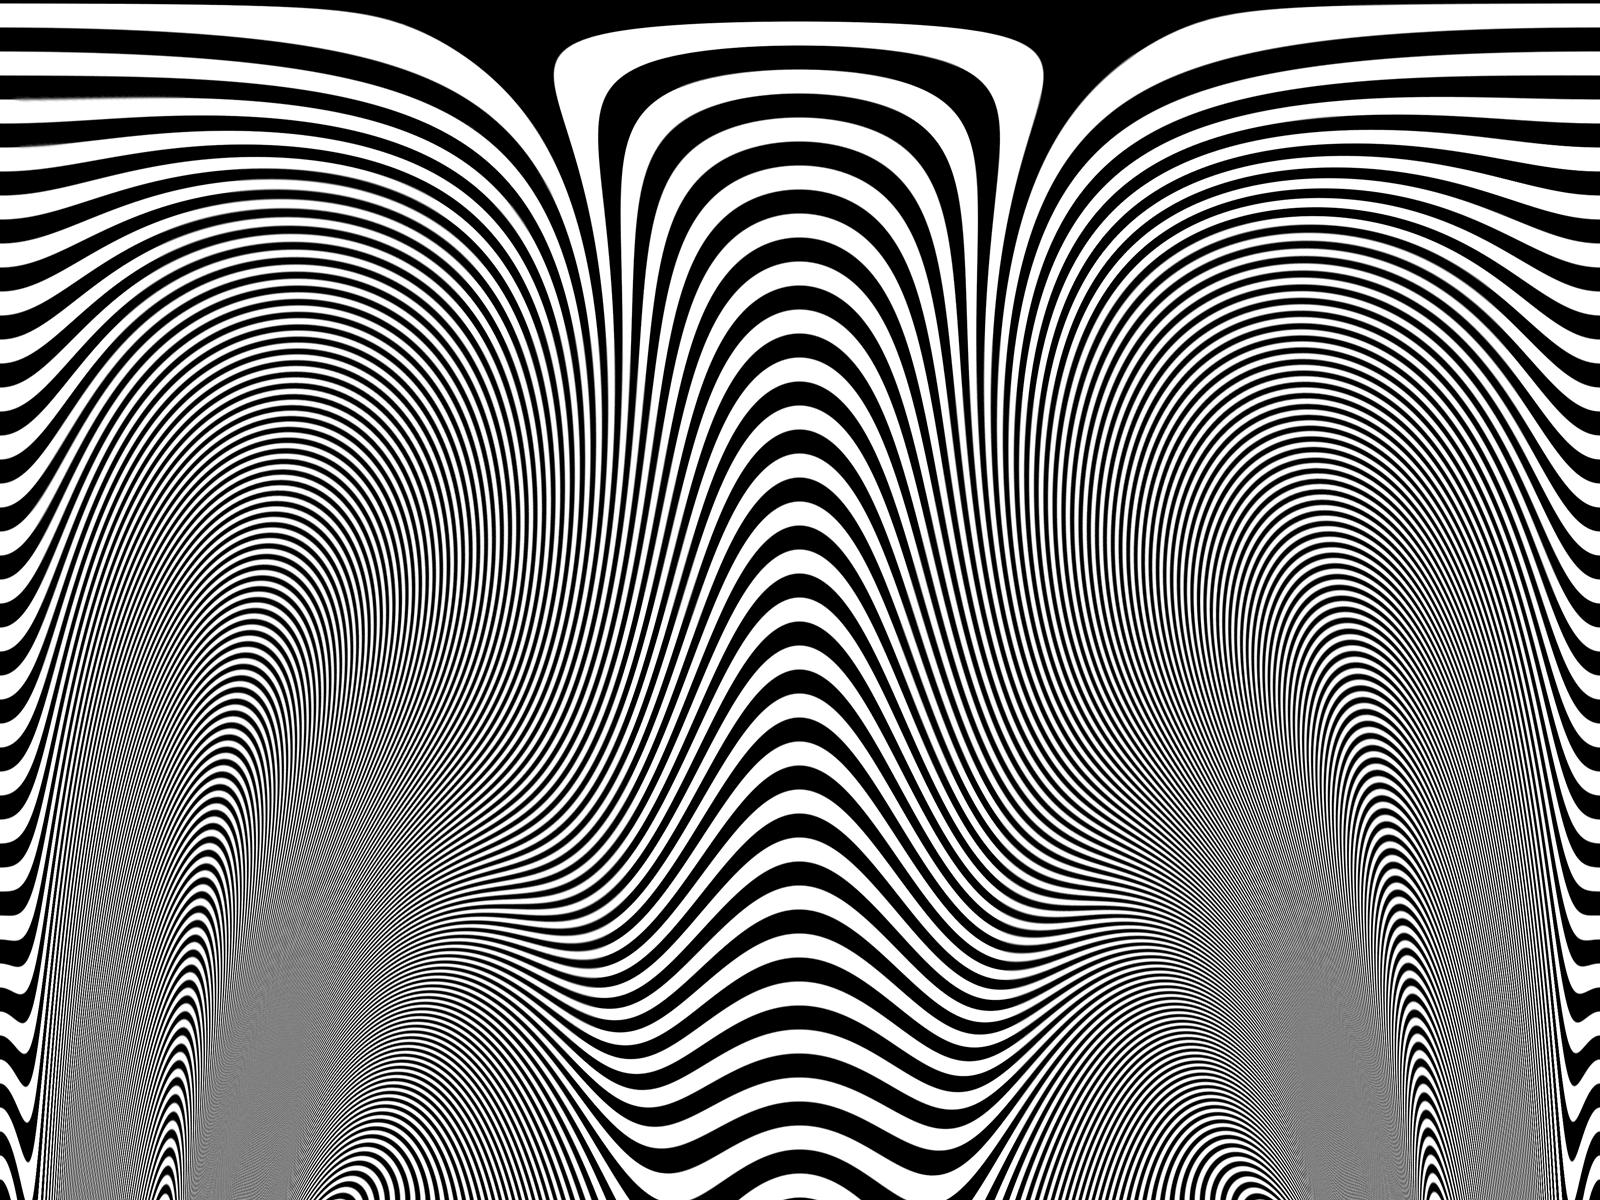 Zebra skin - photo#26